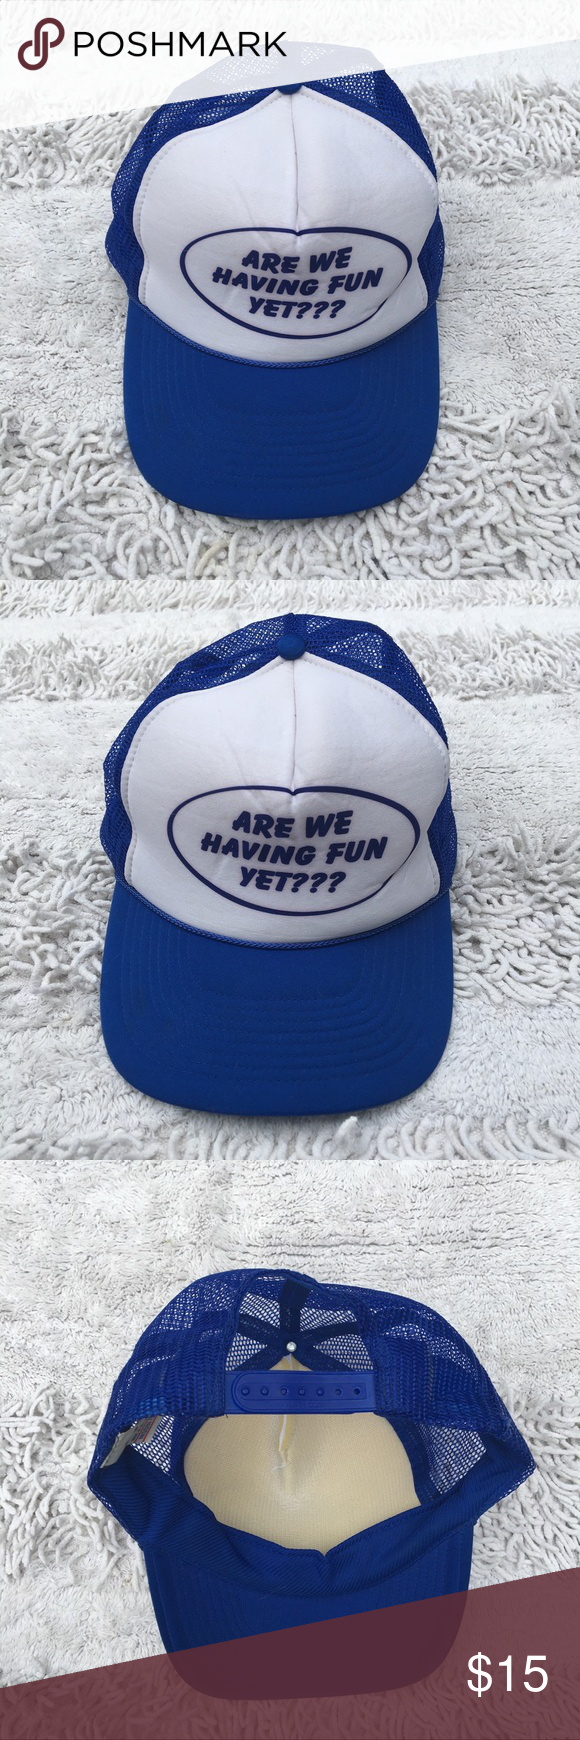 ARE WE HAVING FUN YET Vintage Nissin Hat Frat Cap Classic trucker / snap back ha...#cap #classic #frat #fun #hat #nissin #snap #trucker #vintage